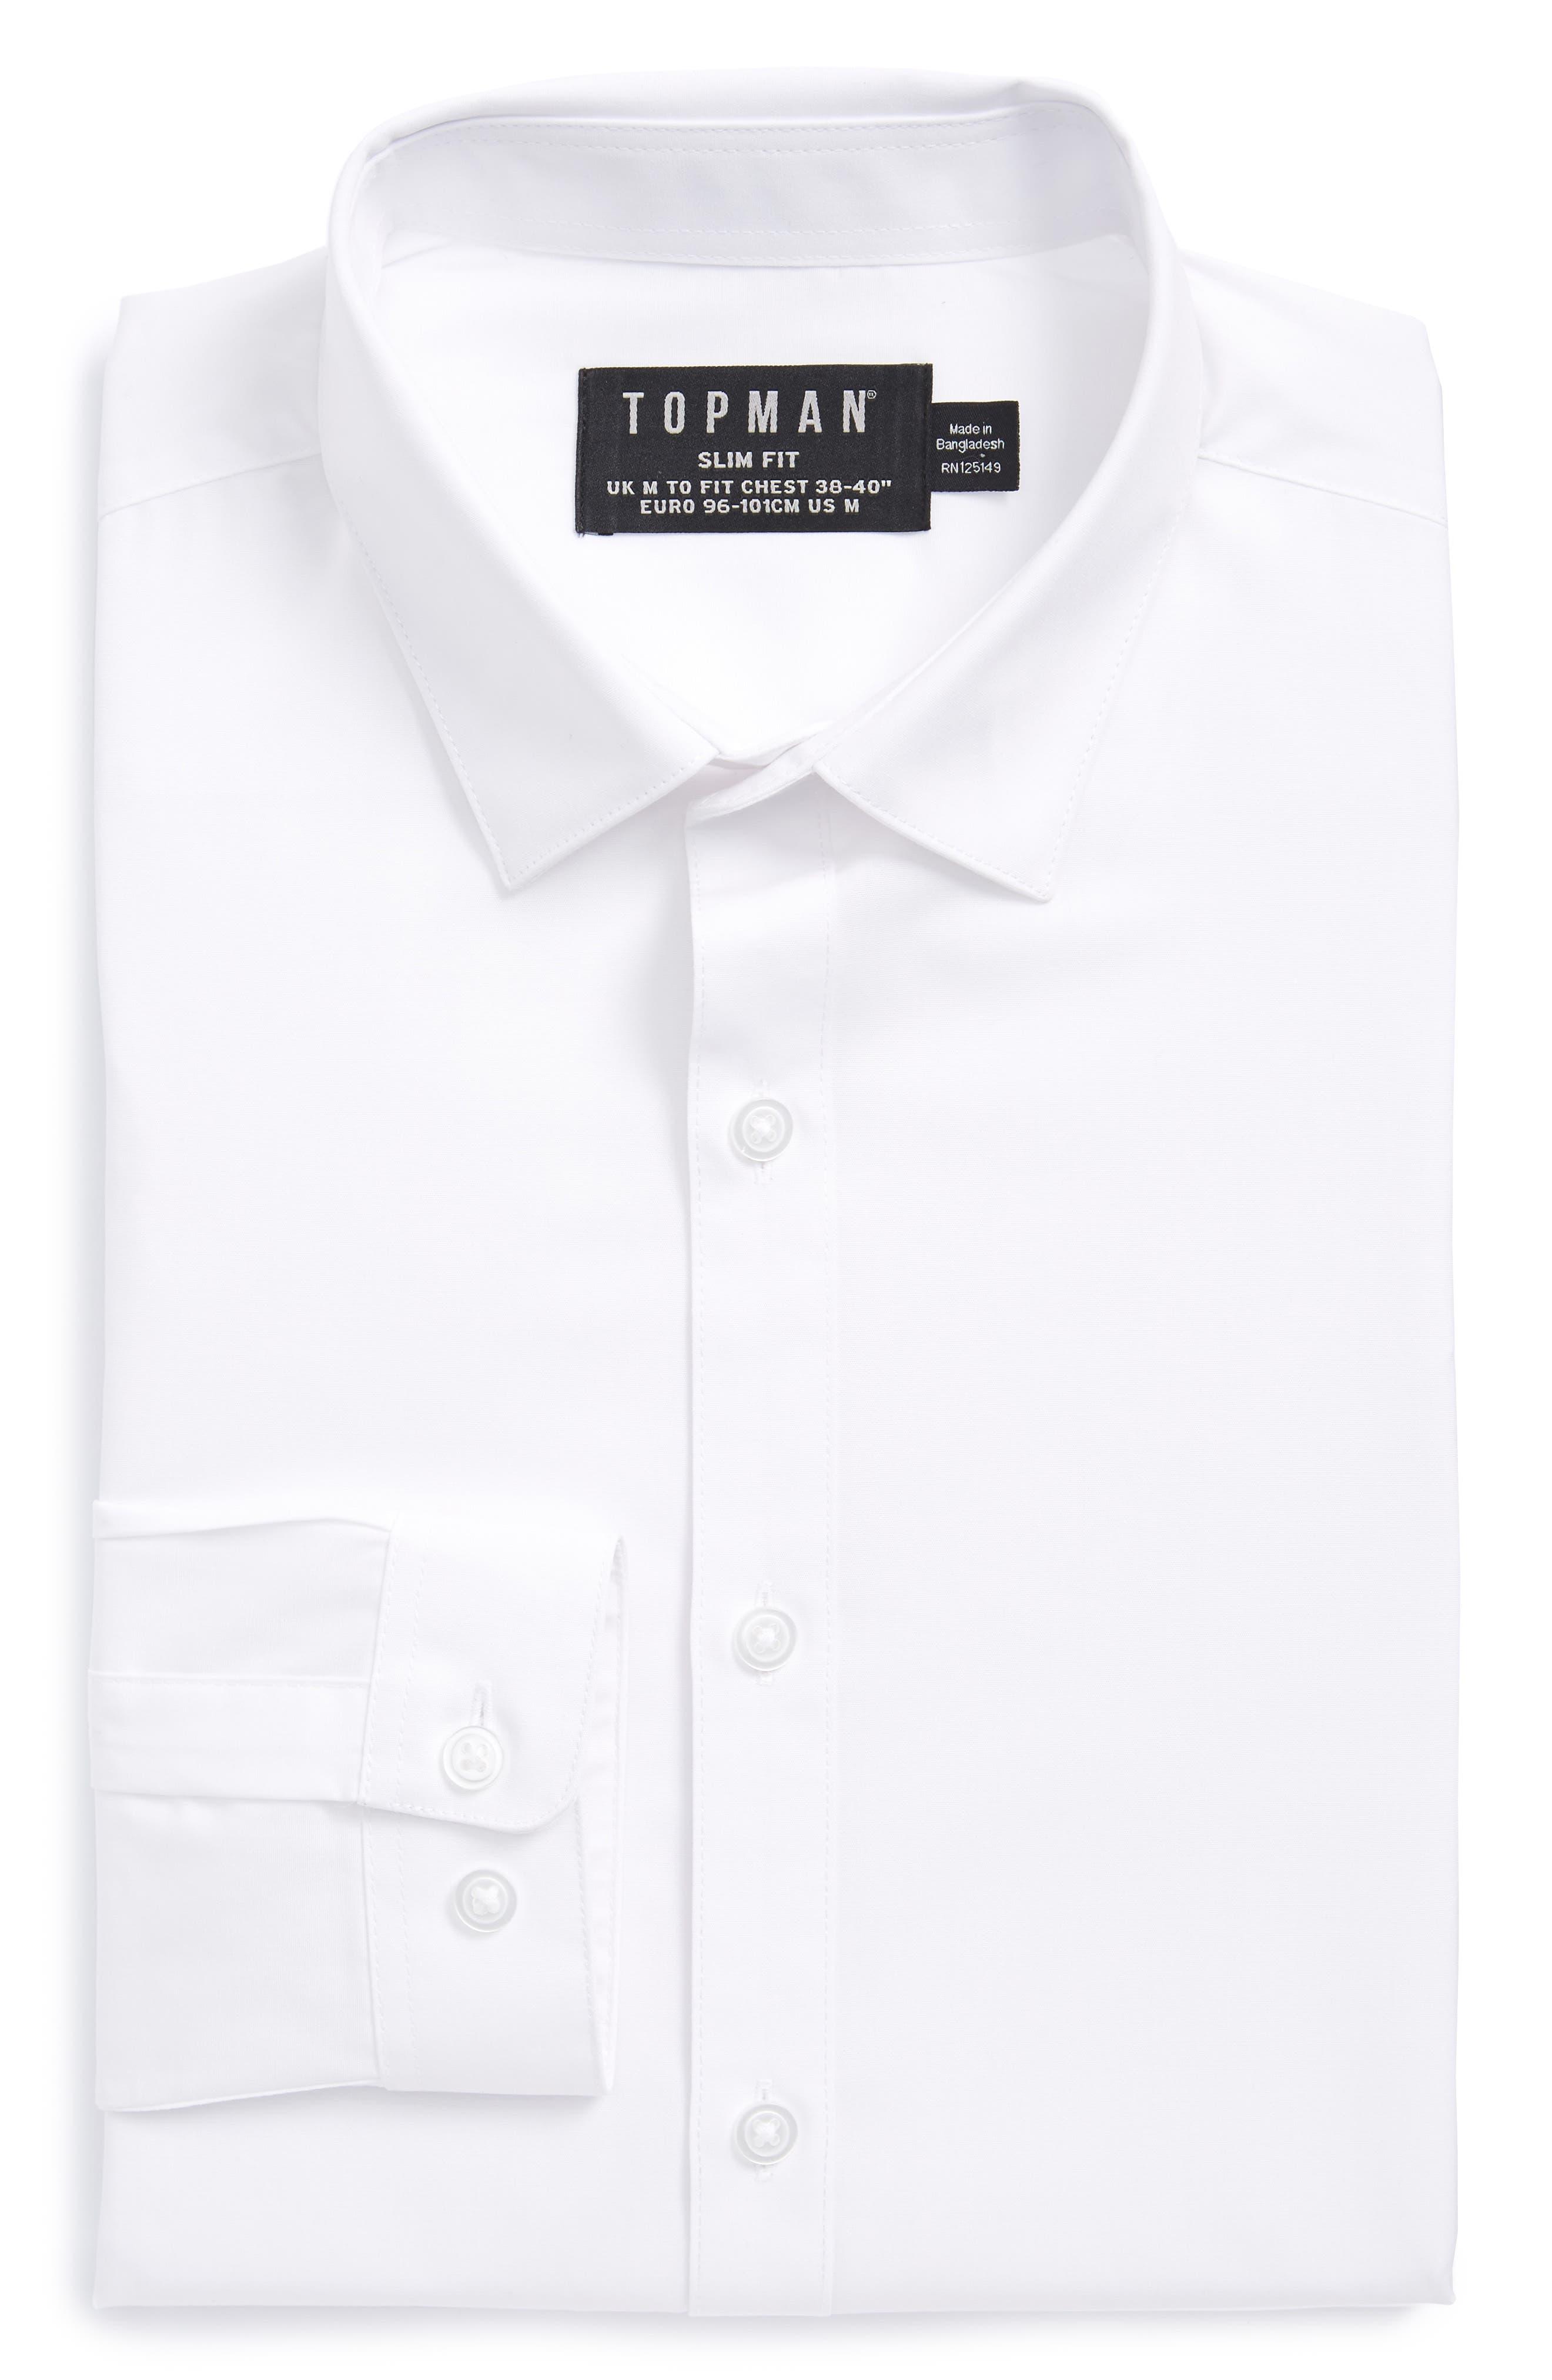 Slim Fit Dress Shirt,                             Main thumbnail 1, color,                             White